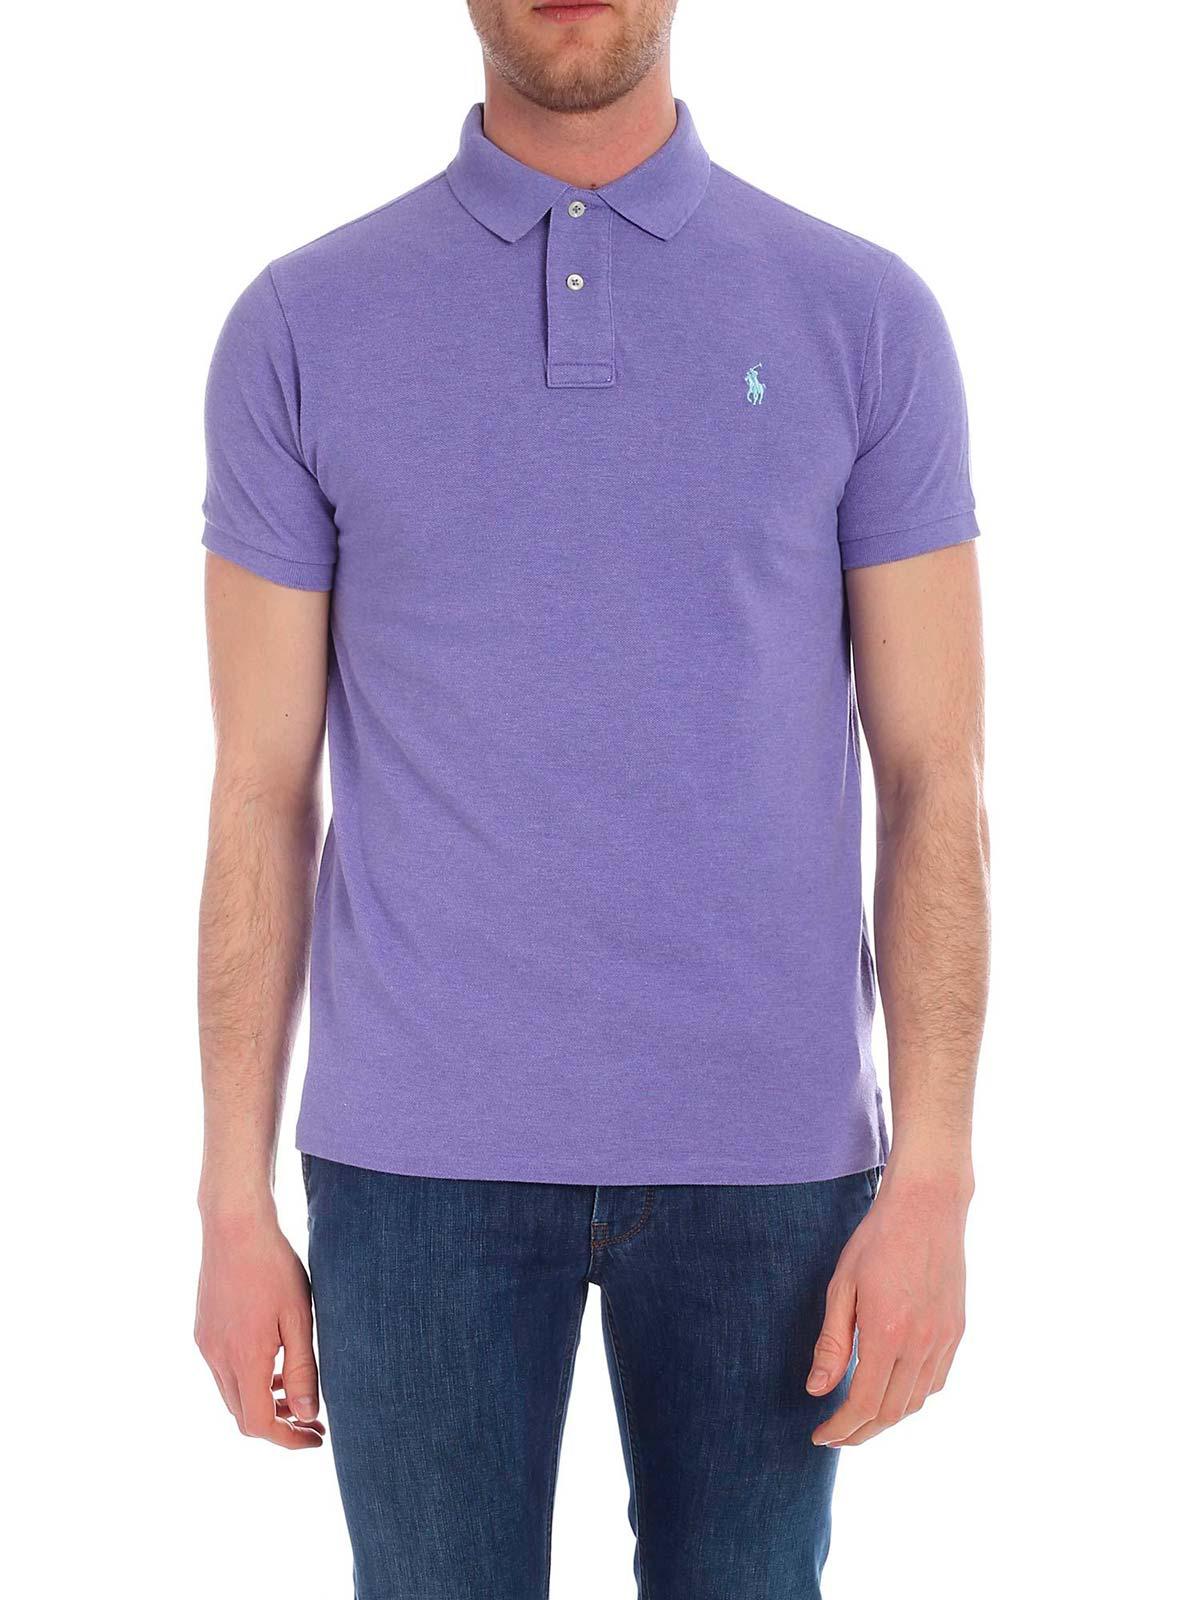 Polo Lauren Shirt Fit Slim Men's Ralph lcK1TFJ